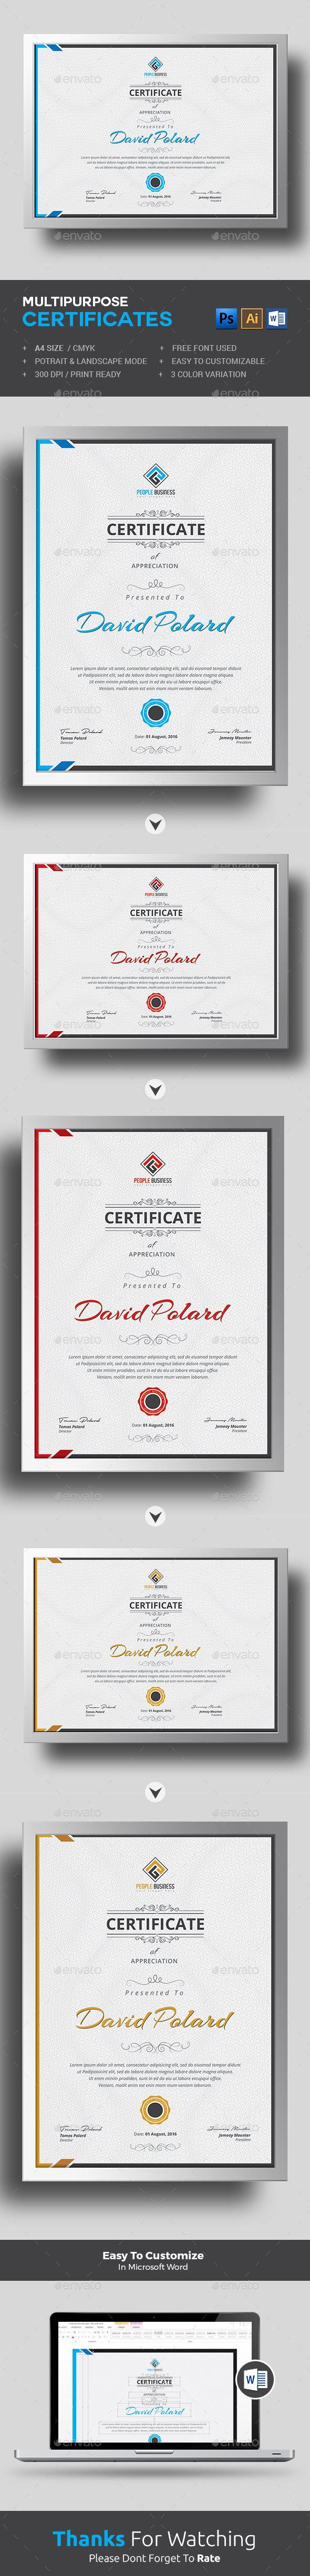 Charmant Kundendienst Zertifikatvorlage Fotos - Entry Level Resume ...